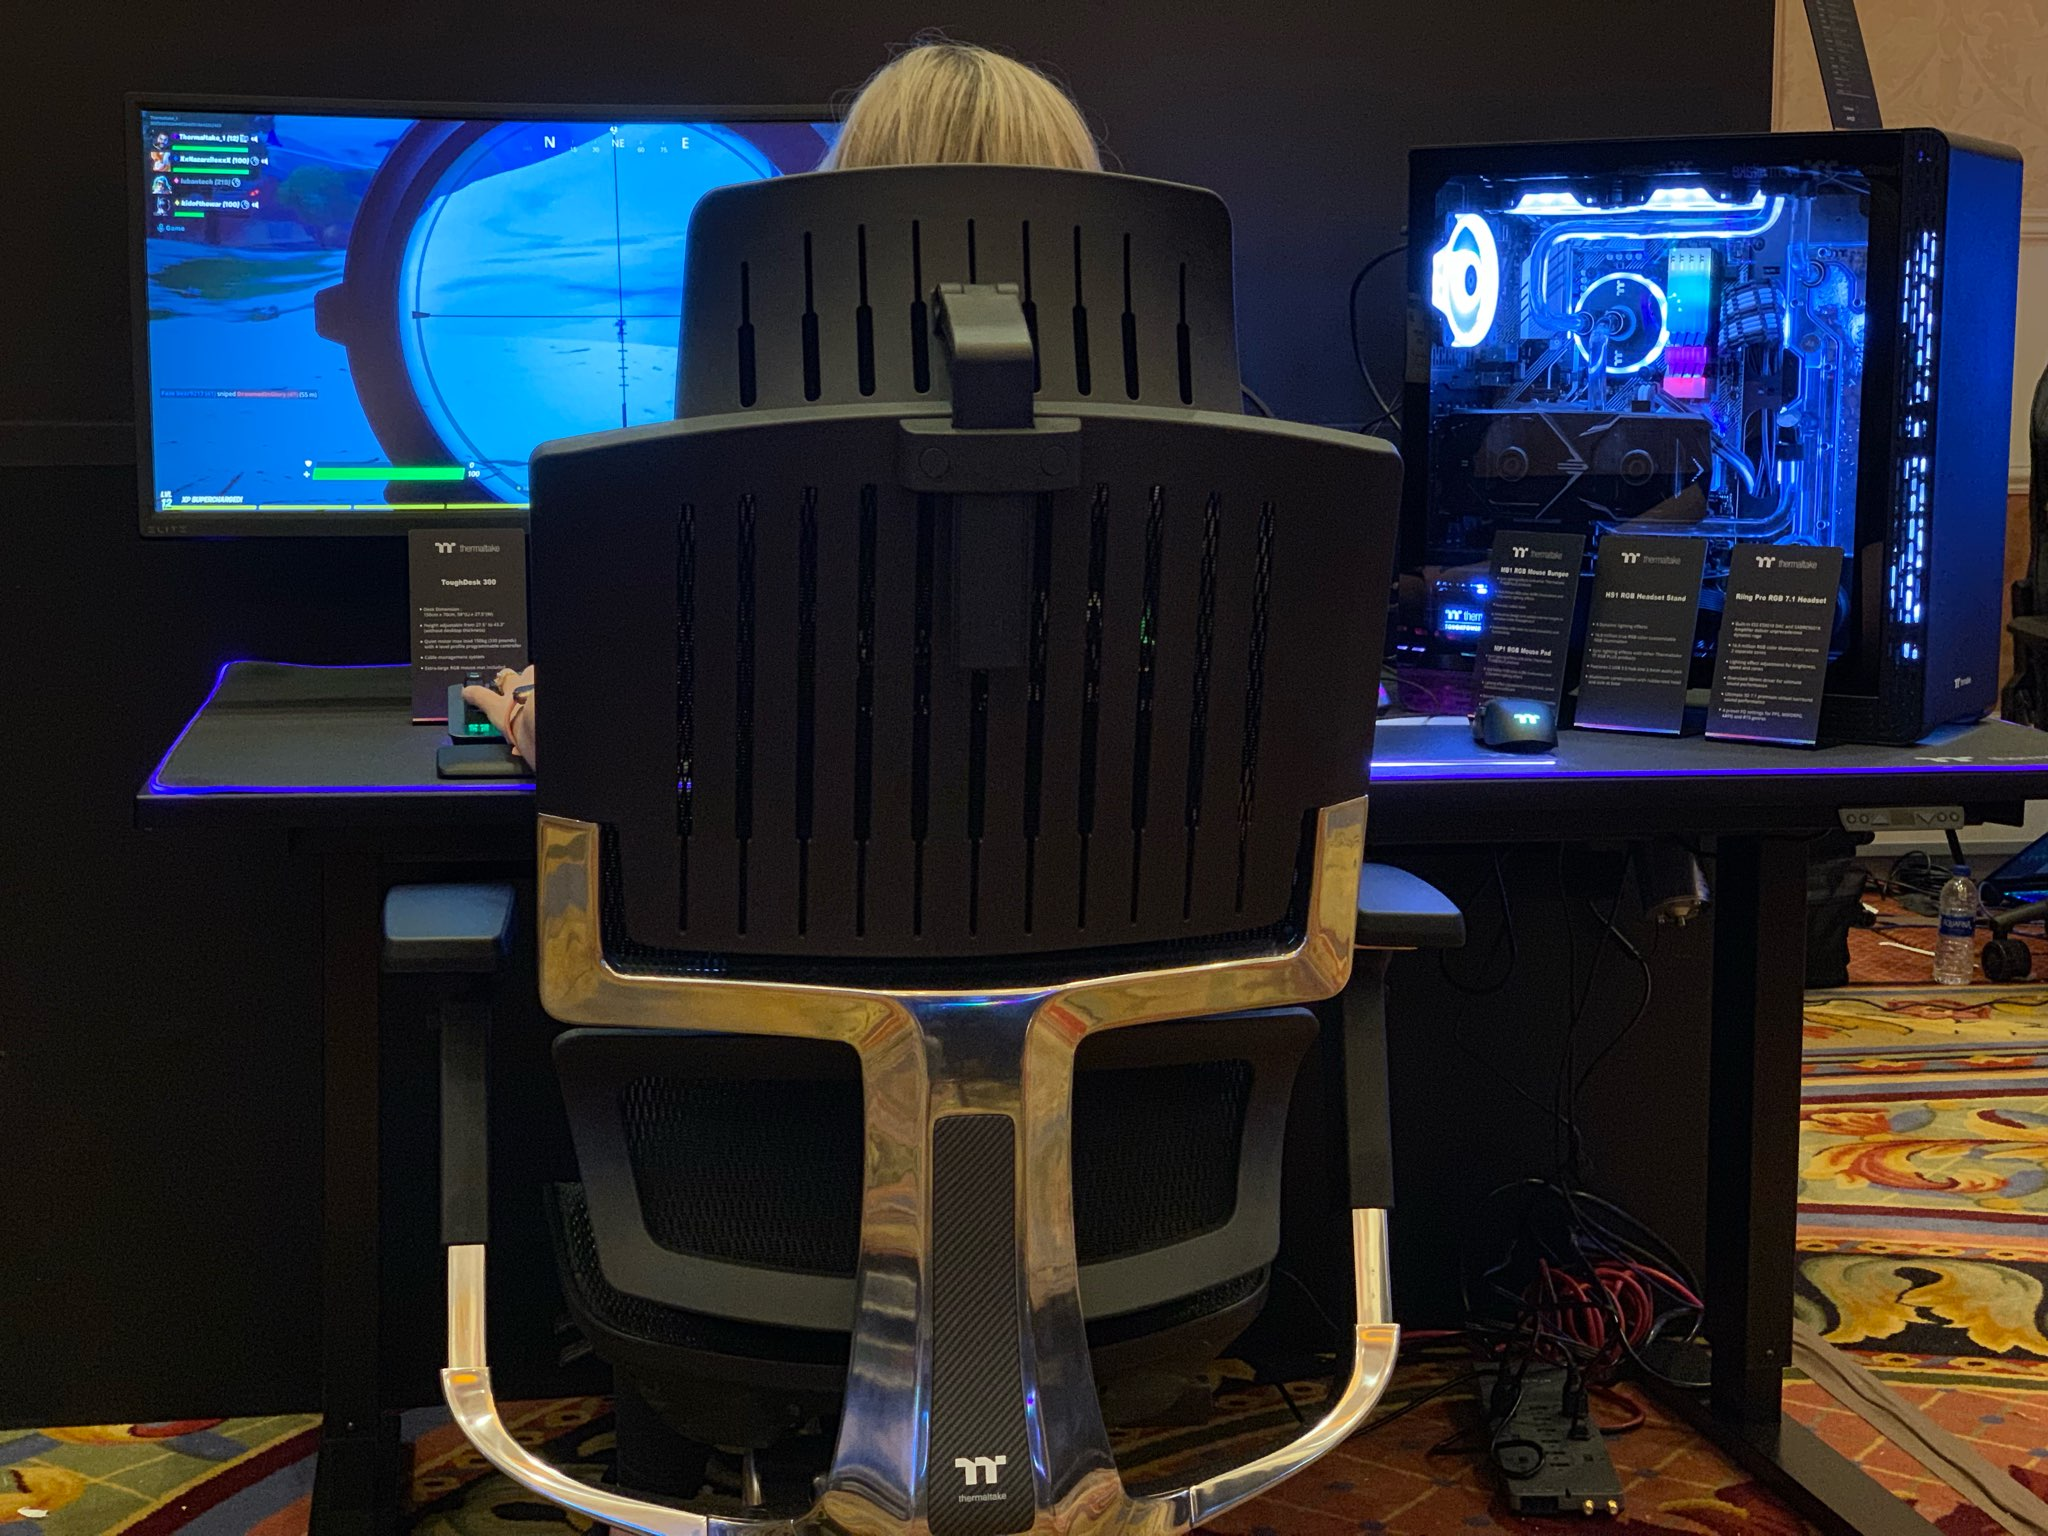 fauteuil Thermaltake CyberChair E500